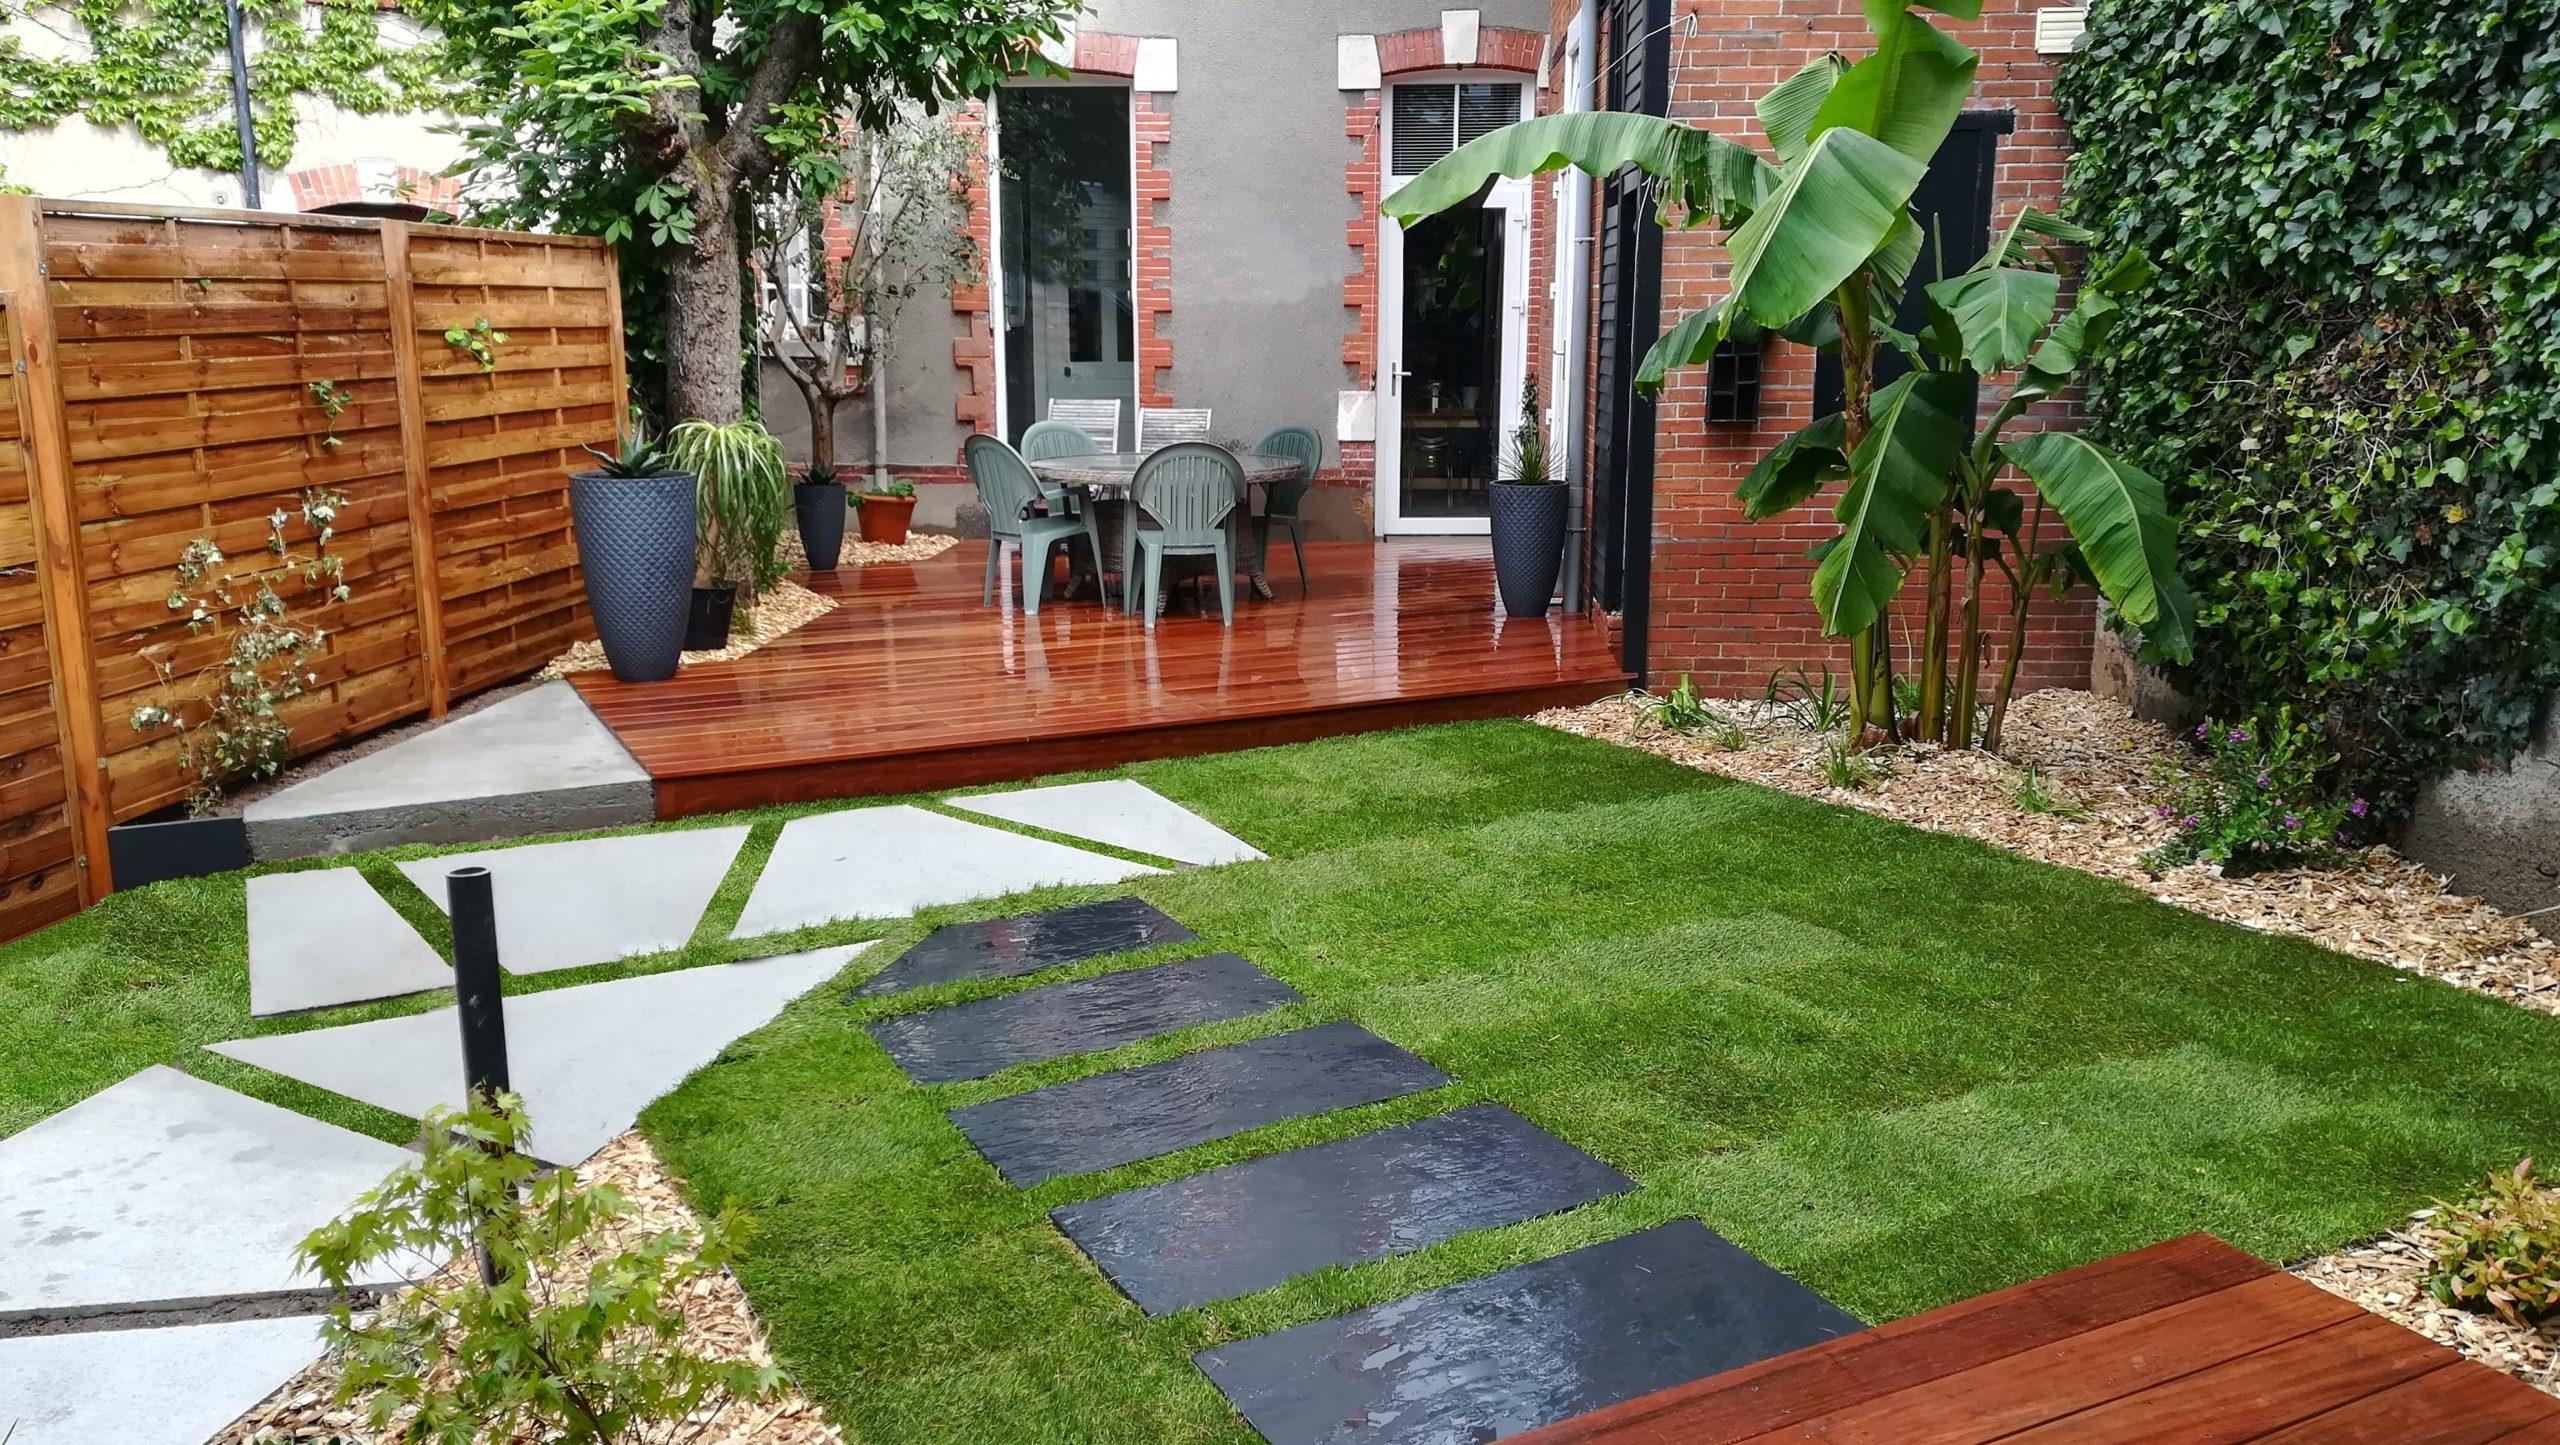 jardin après la pluie obojardin